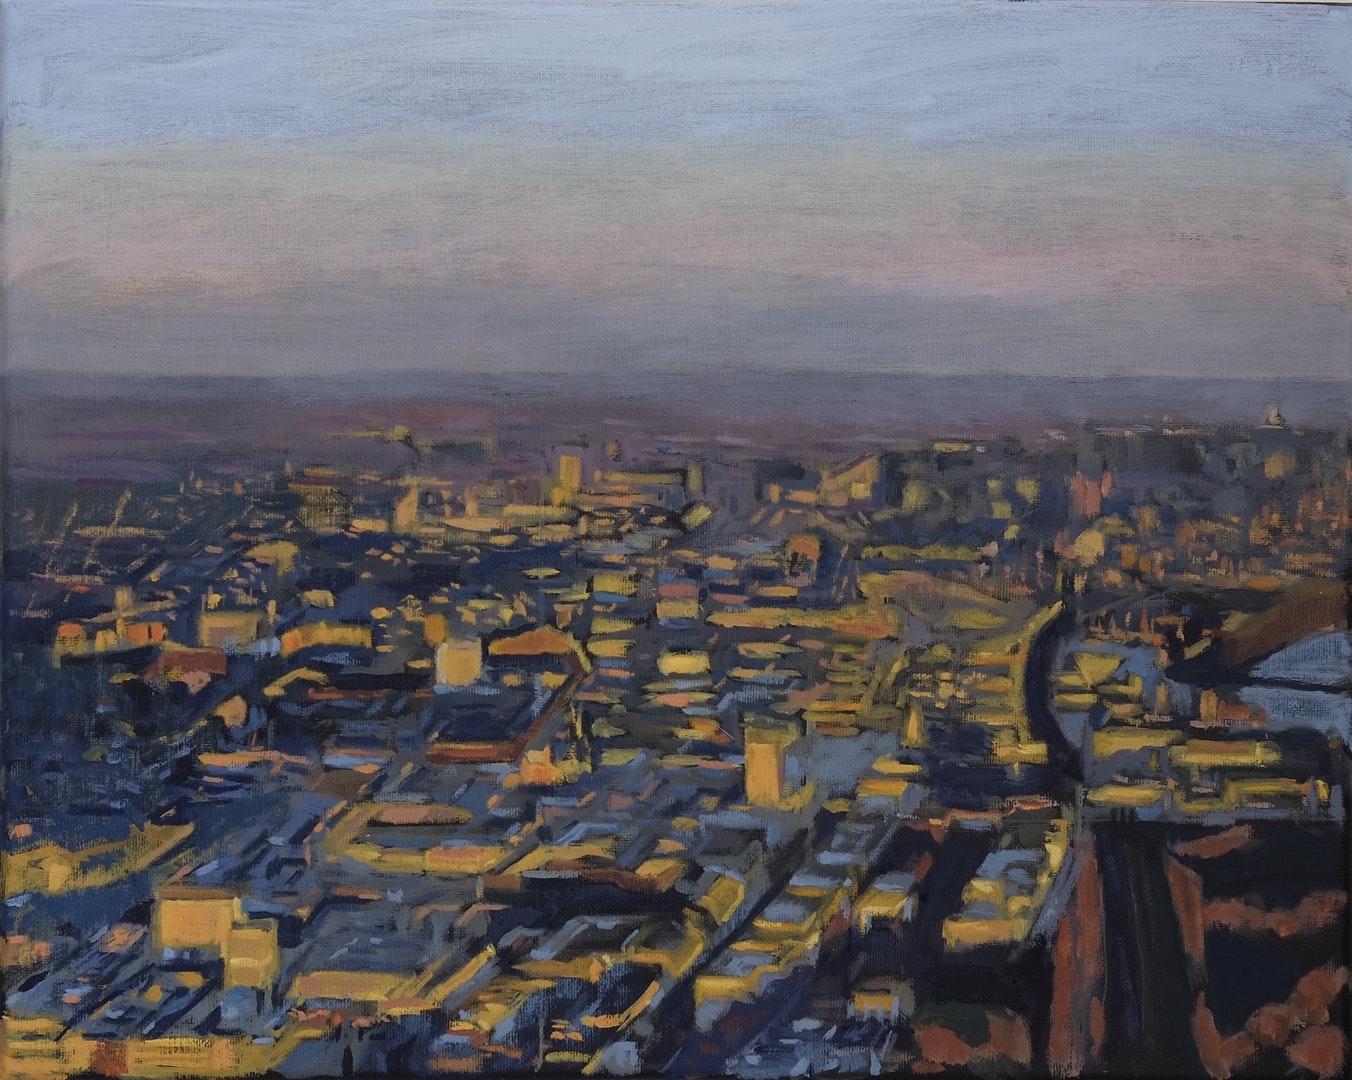 'Aerial View, London', Ian Kaye, Oil, 50 x 40 cm